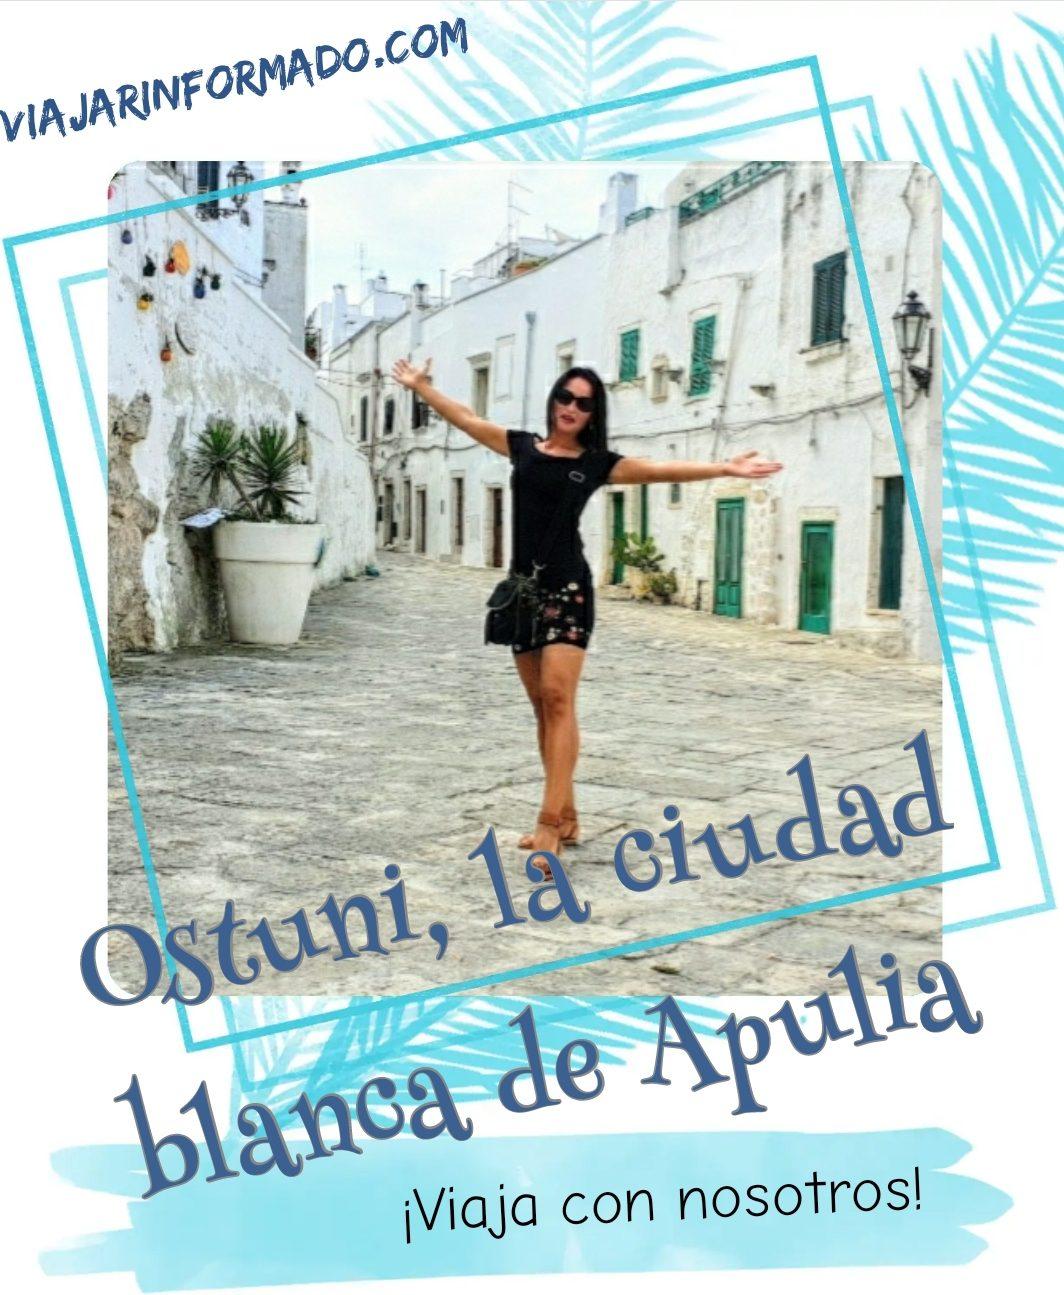 ostuni-la-ciudad-blanca-de-apulia